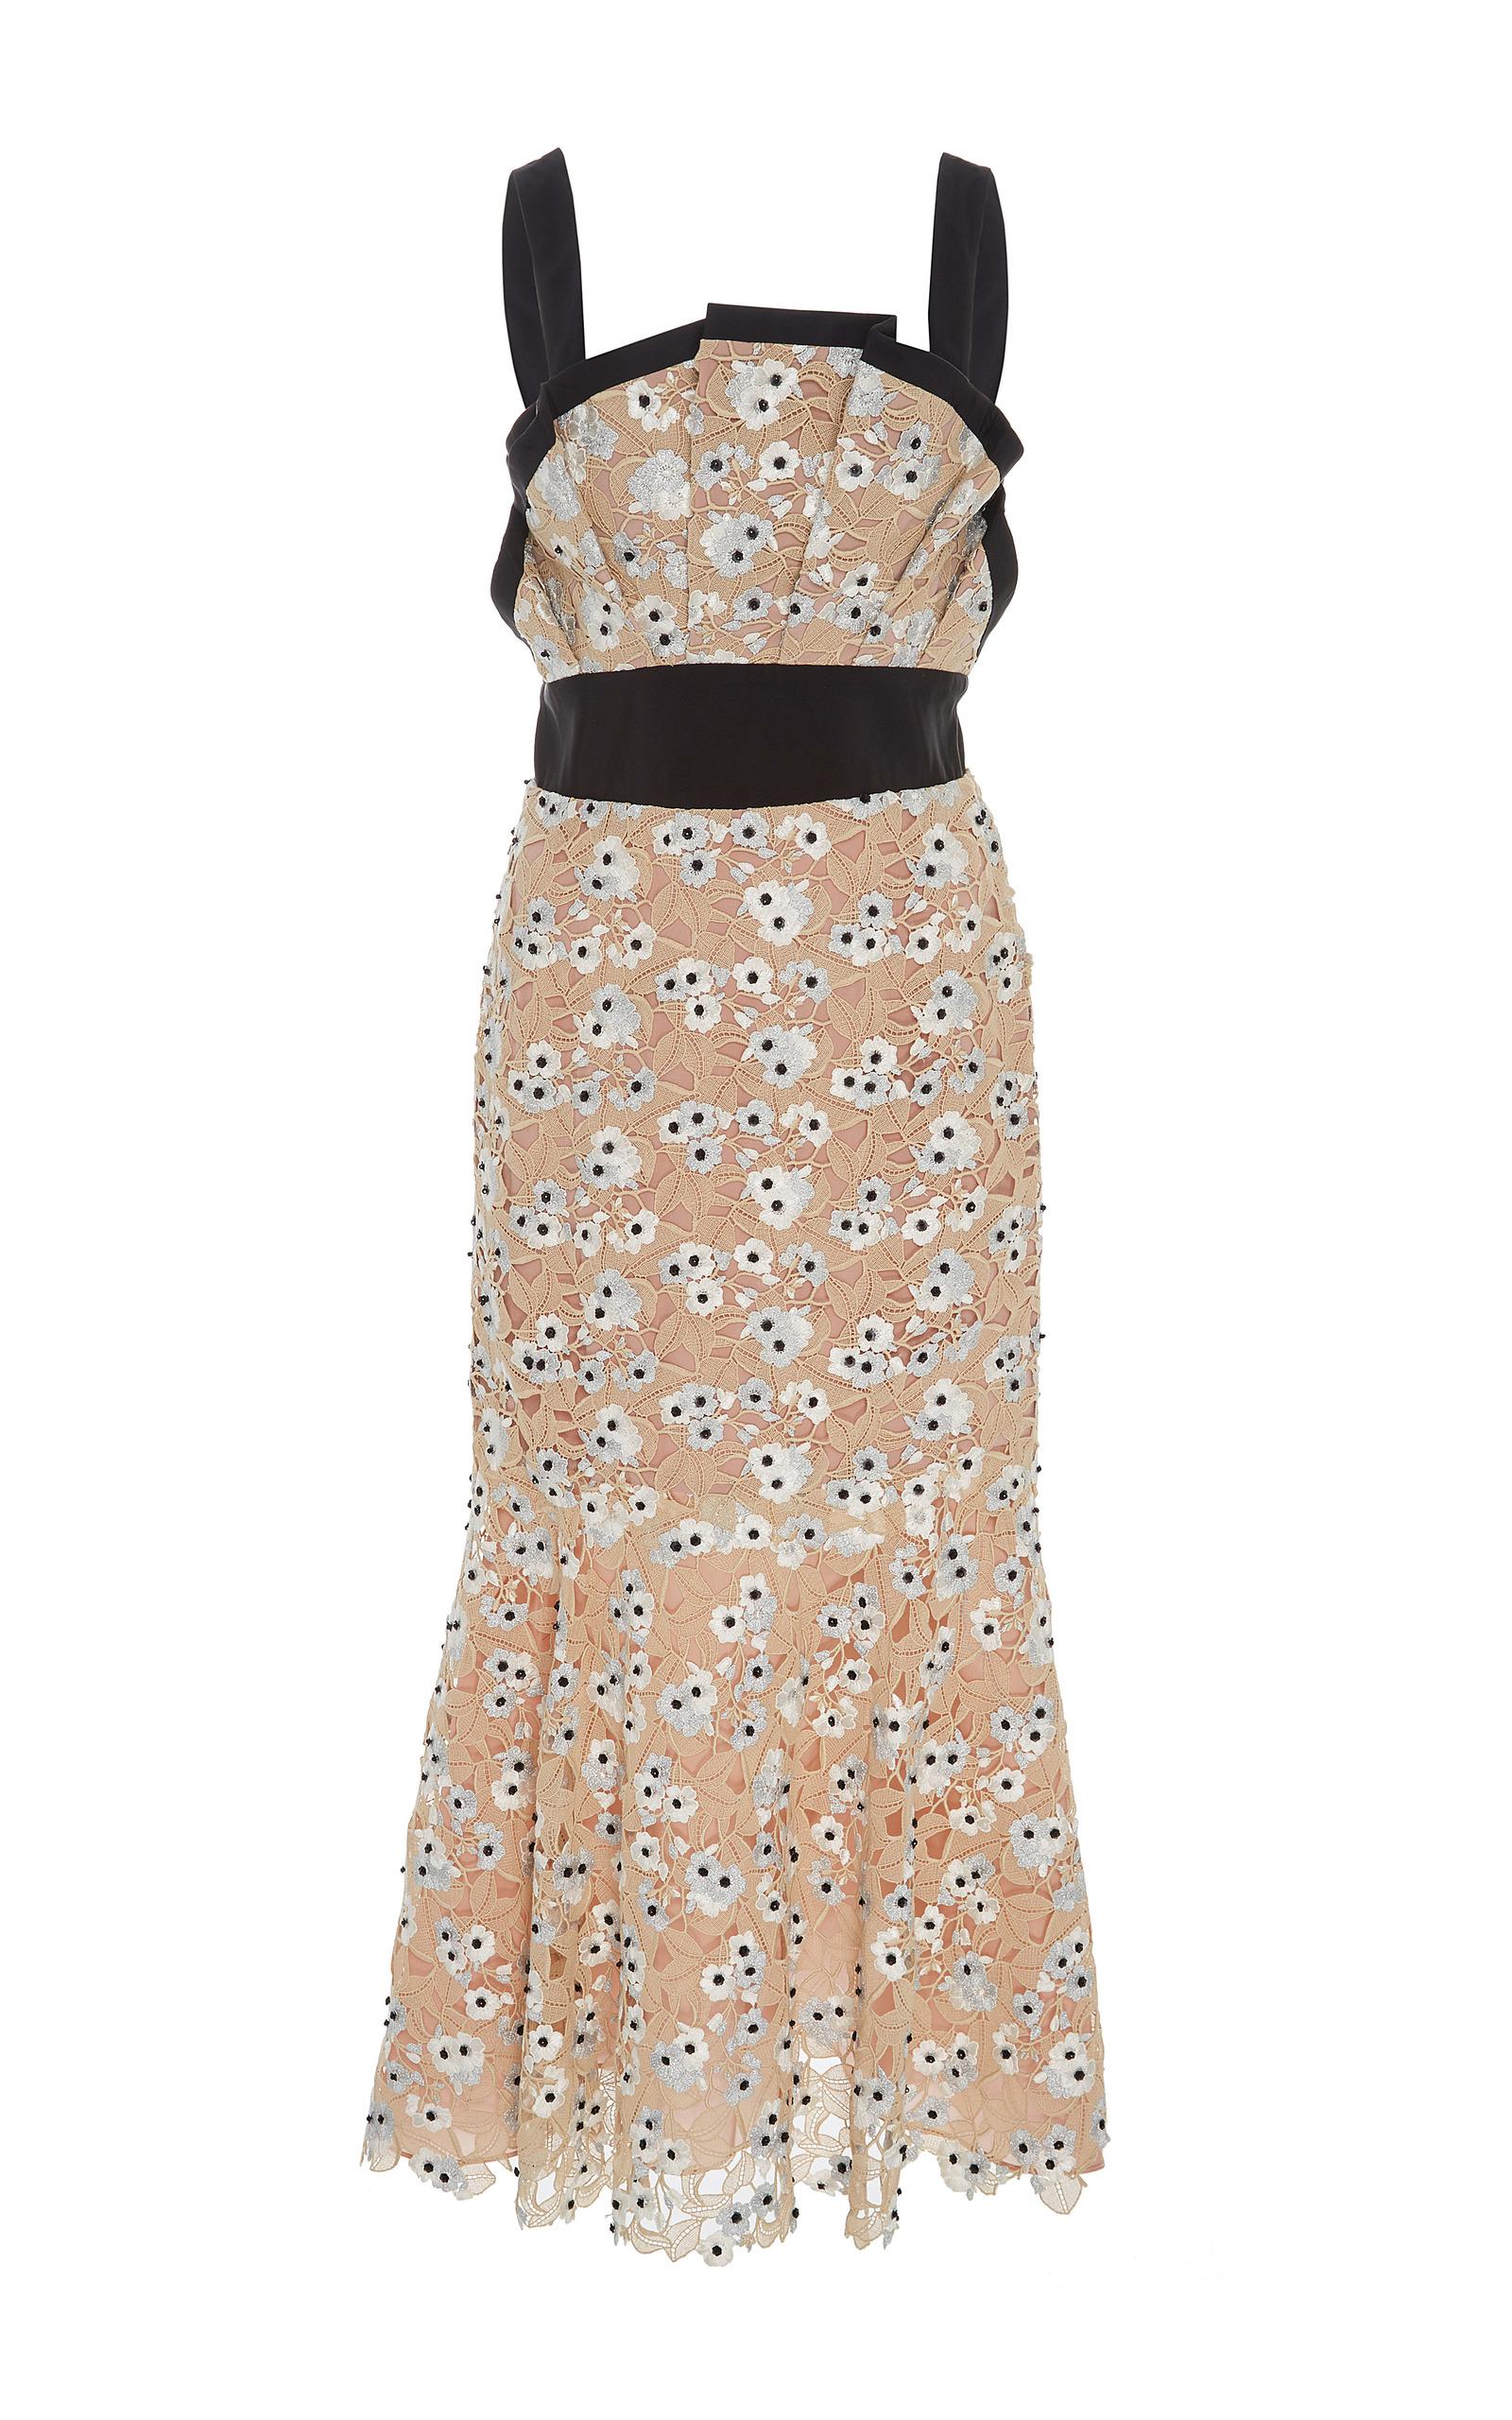 M O Exclusive Birth Of Venus Midi Dress By Johanna Moda